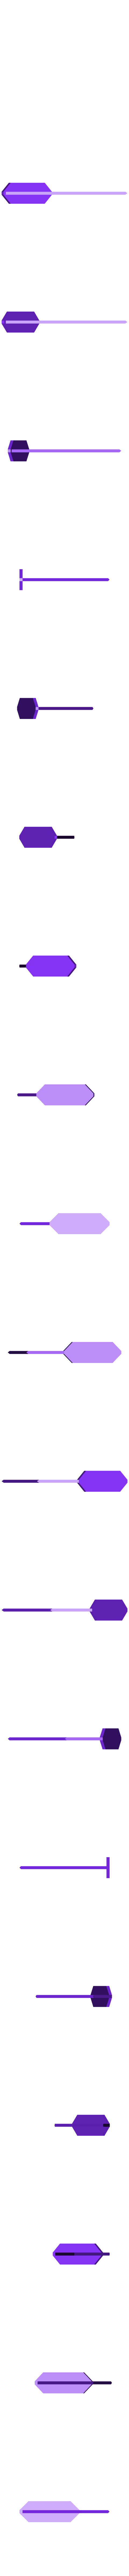 F048bc00 dd18 44b0 a564 d8af44313932